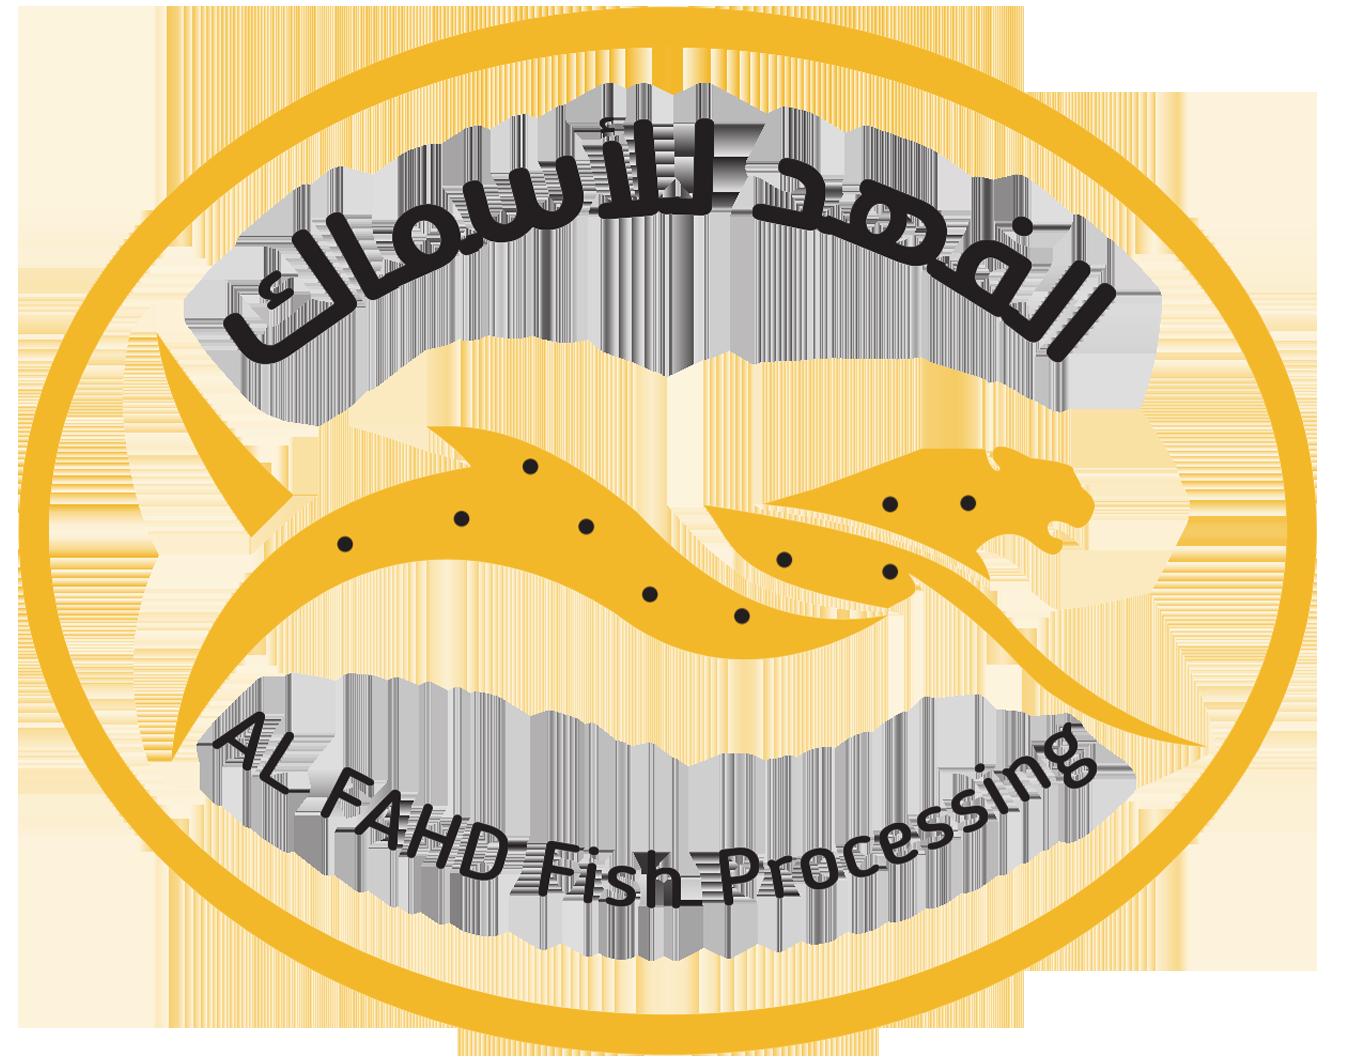 Alfahd Group